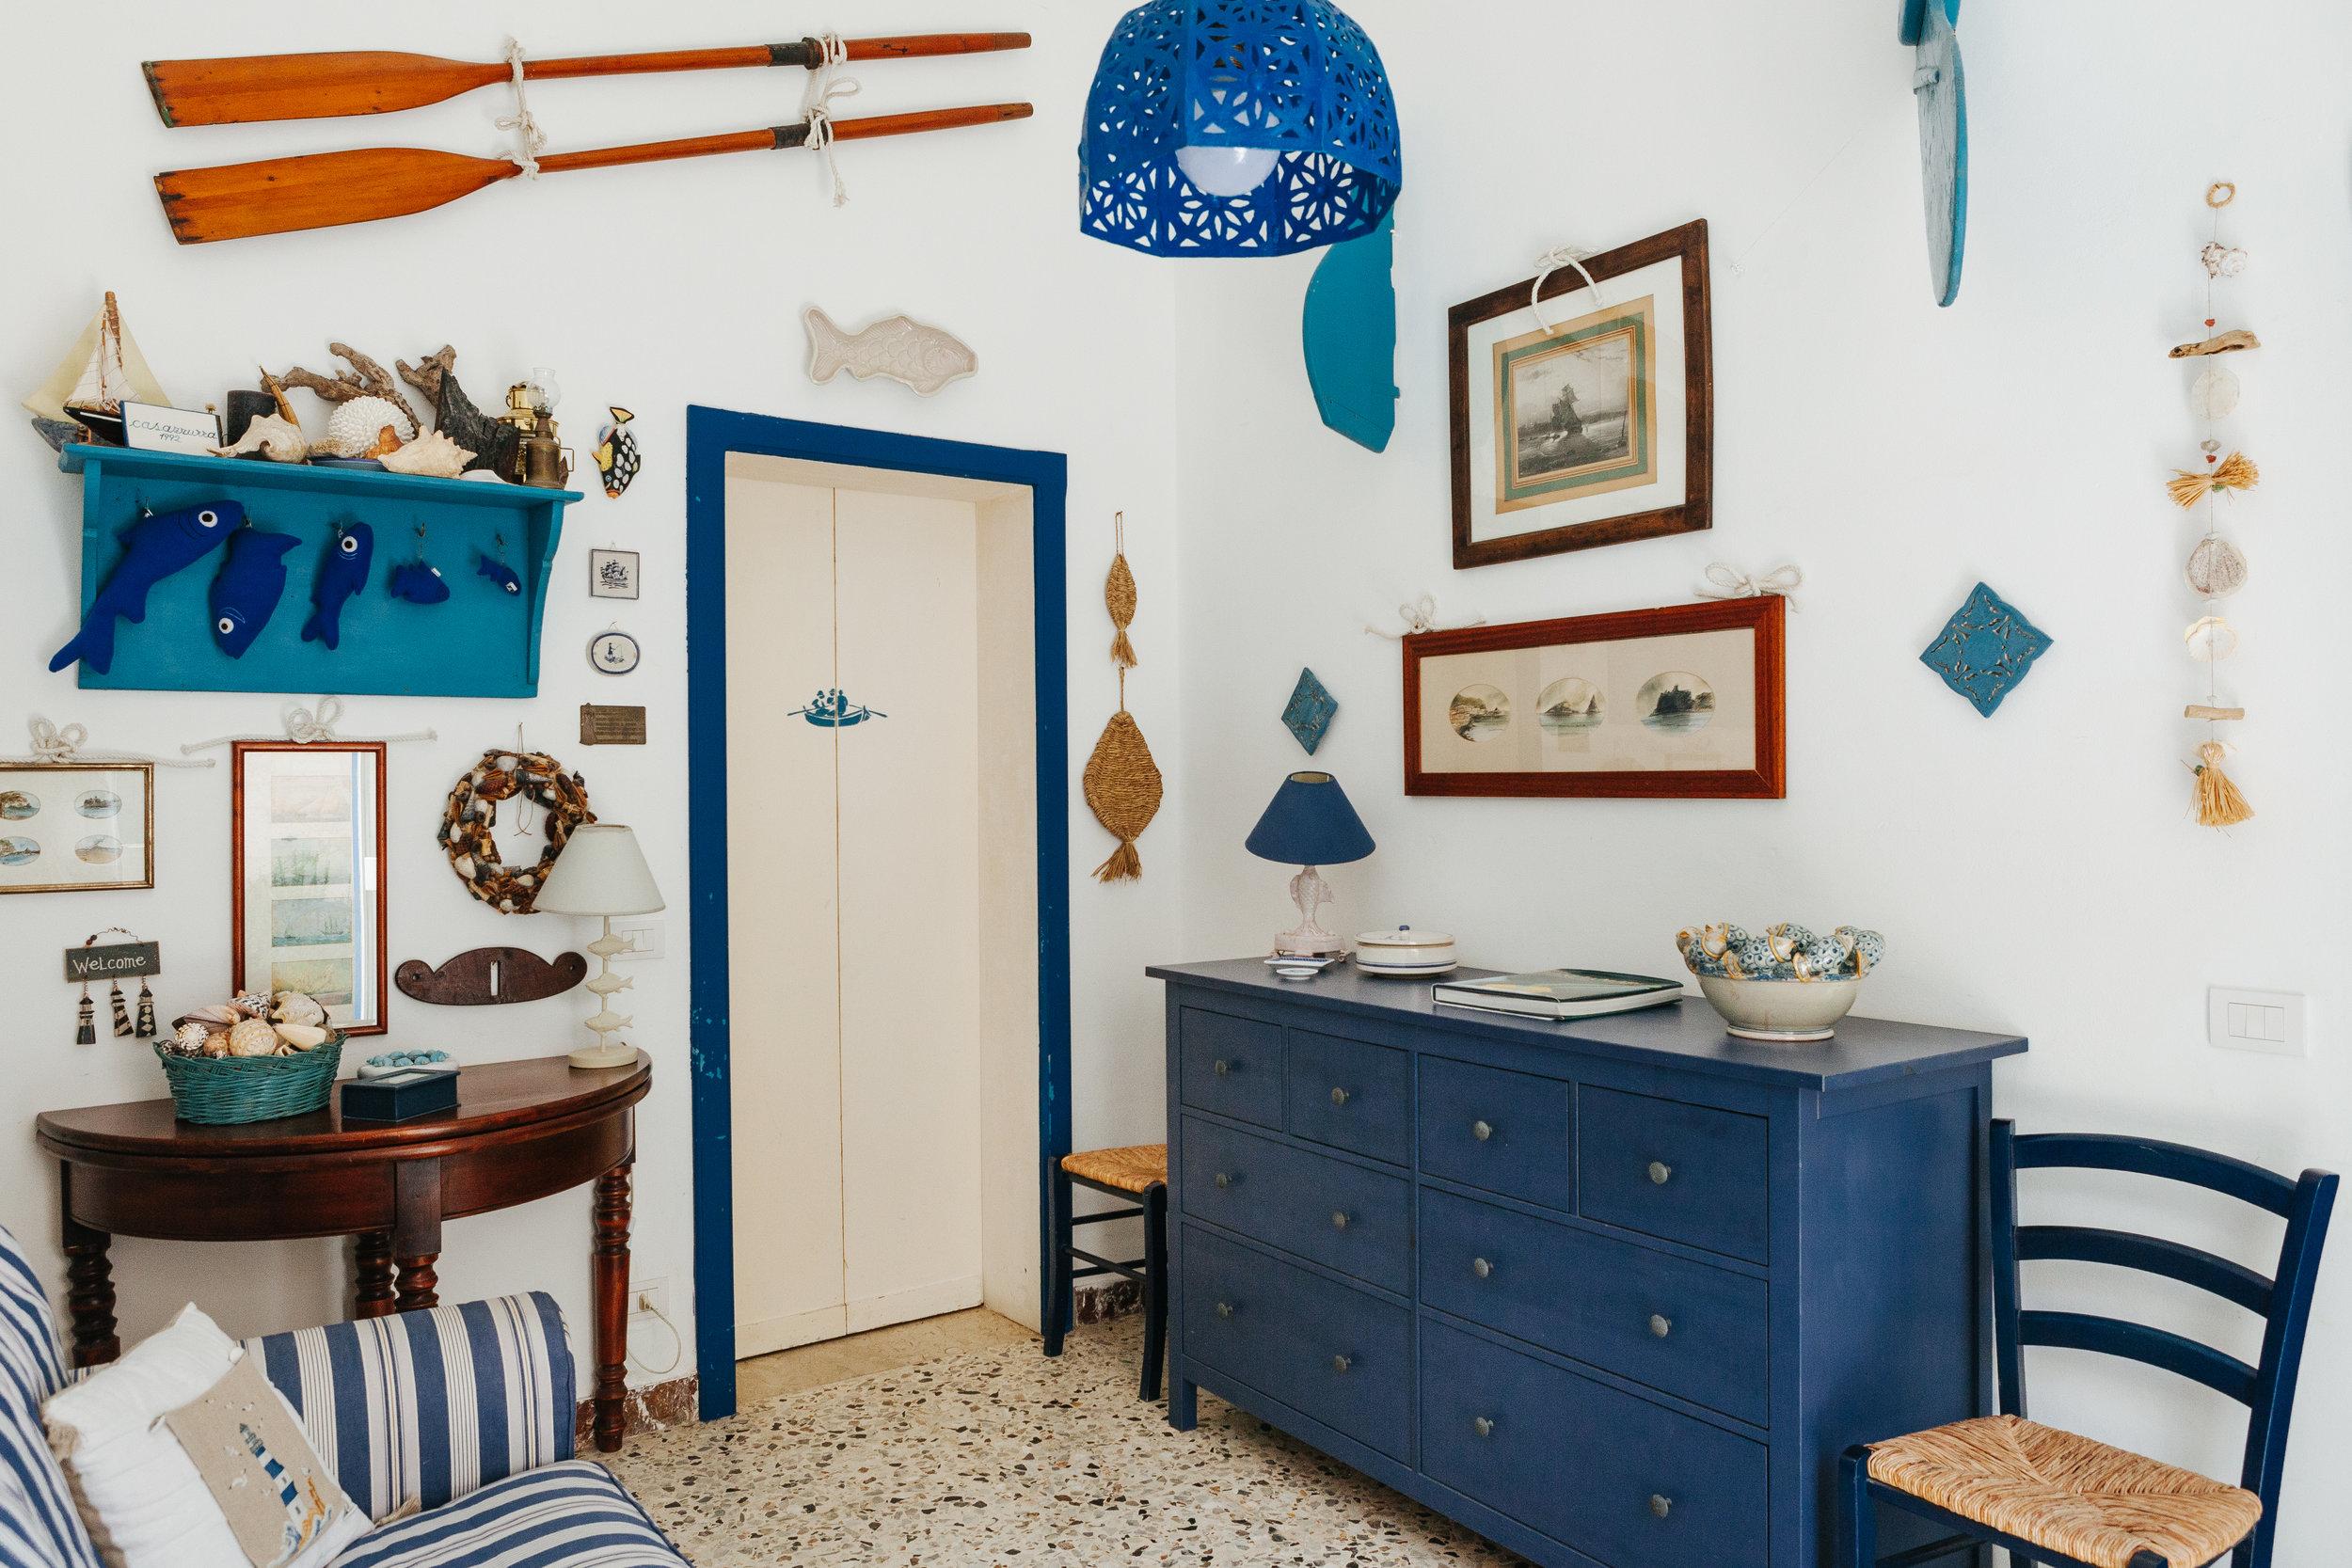 4sampieri-casa-vacanze-sicilia-appartamento-sicily-holiday-apartment-casazzurra-italia-italy.jpg